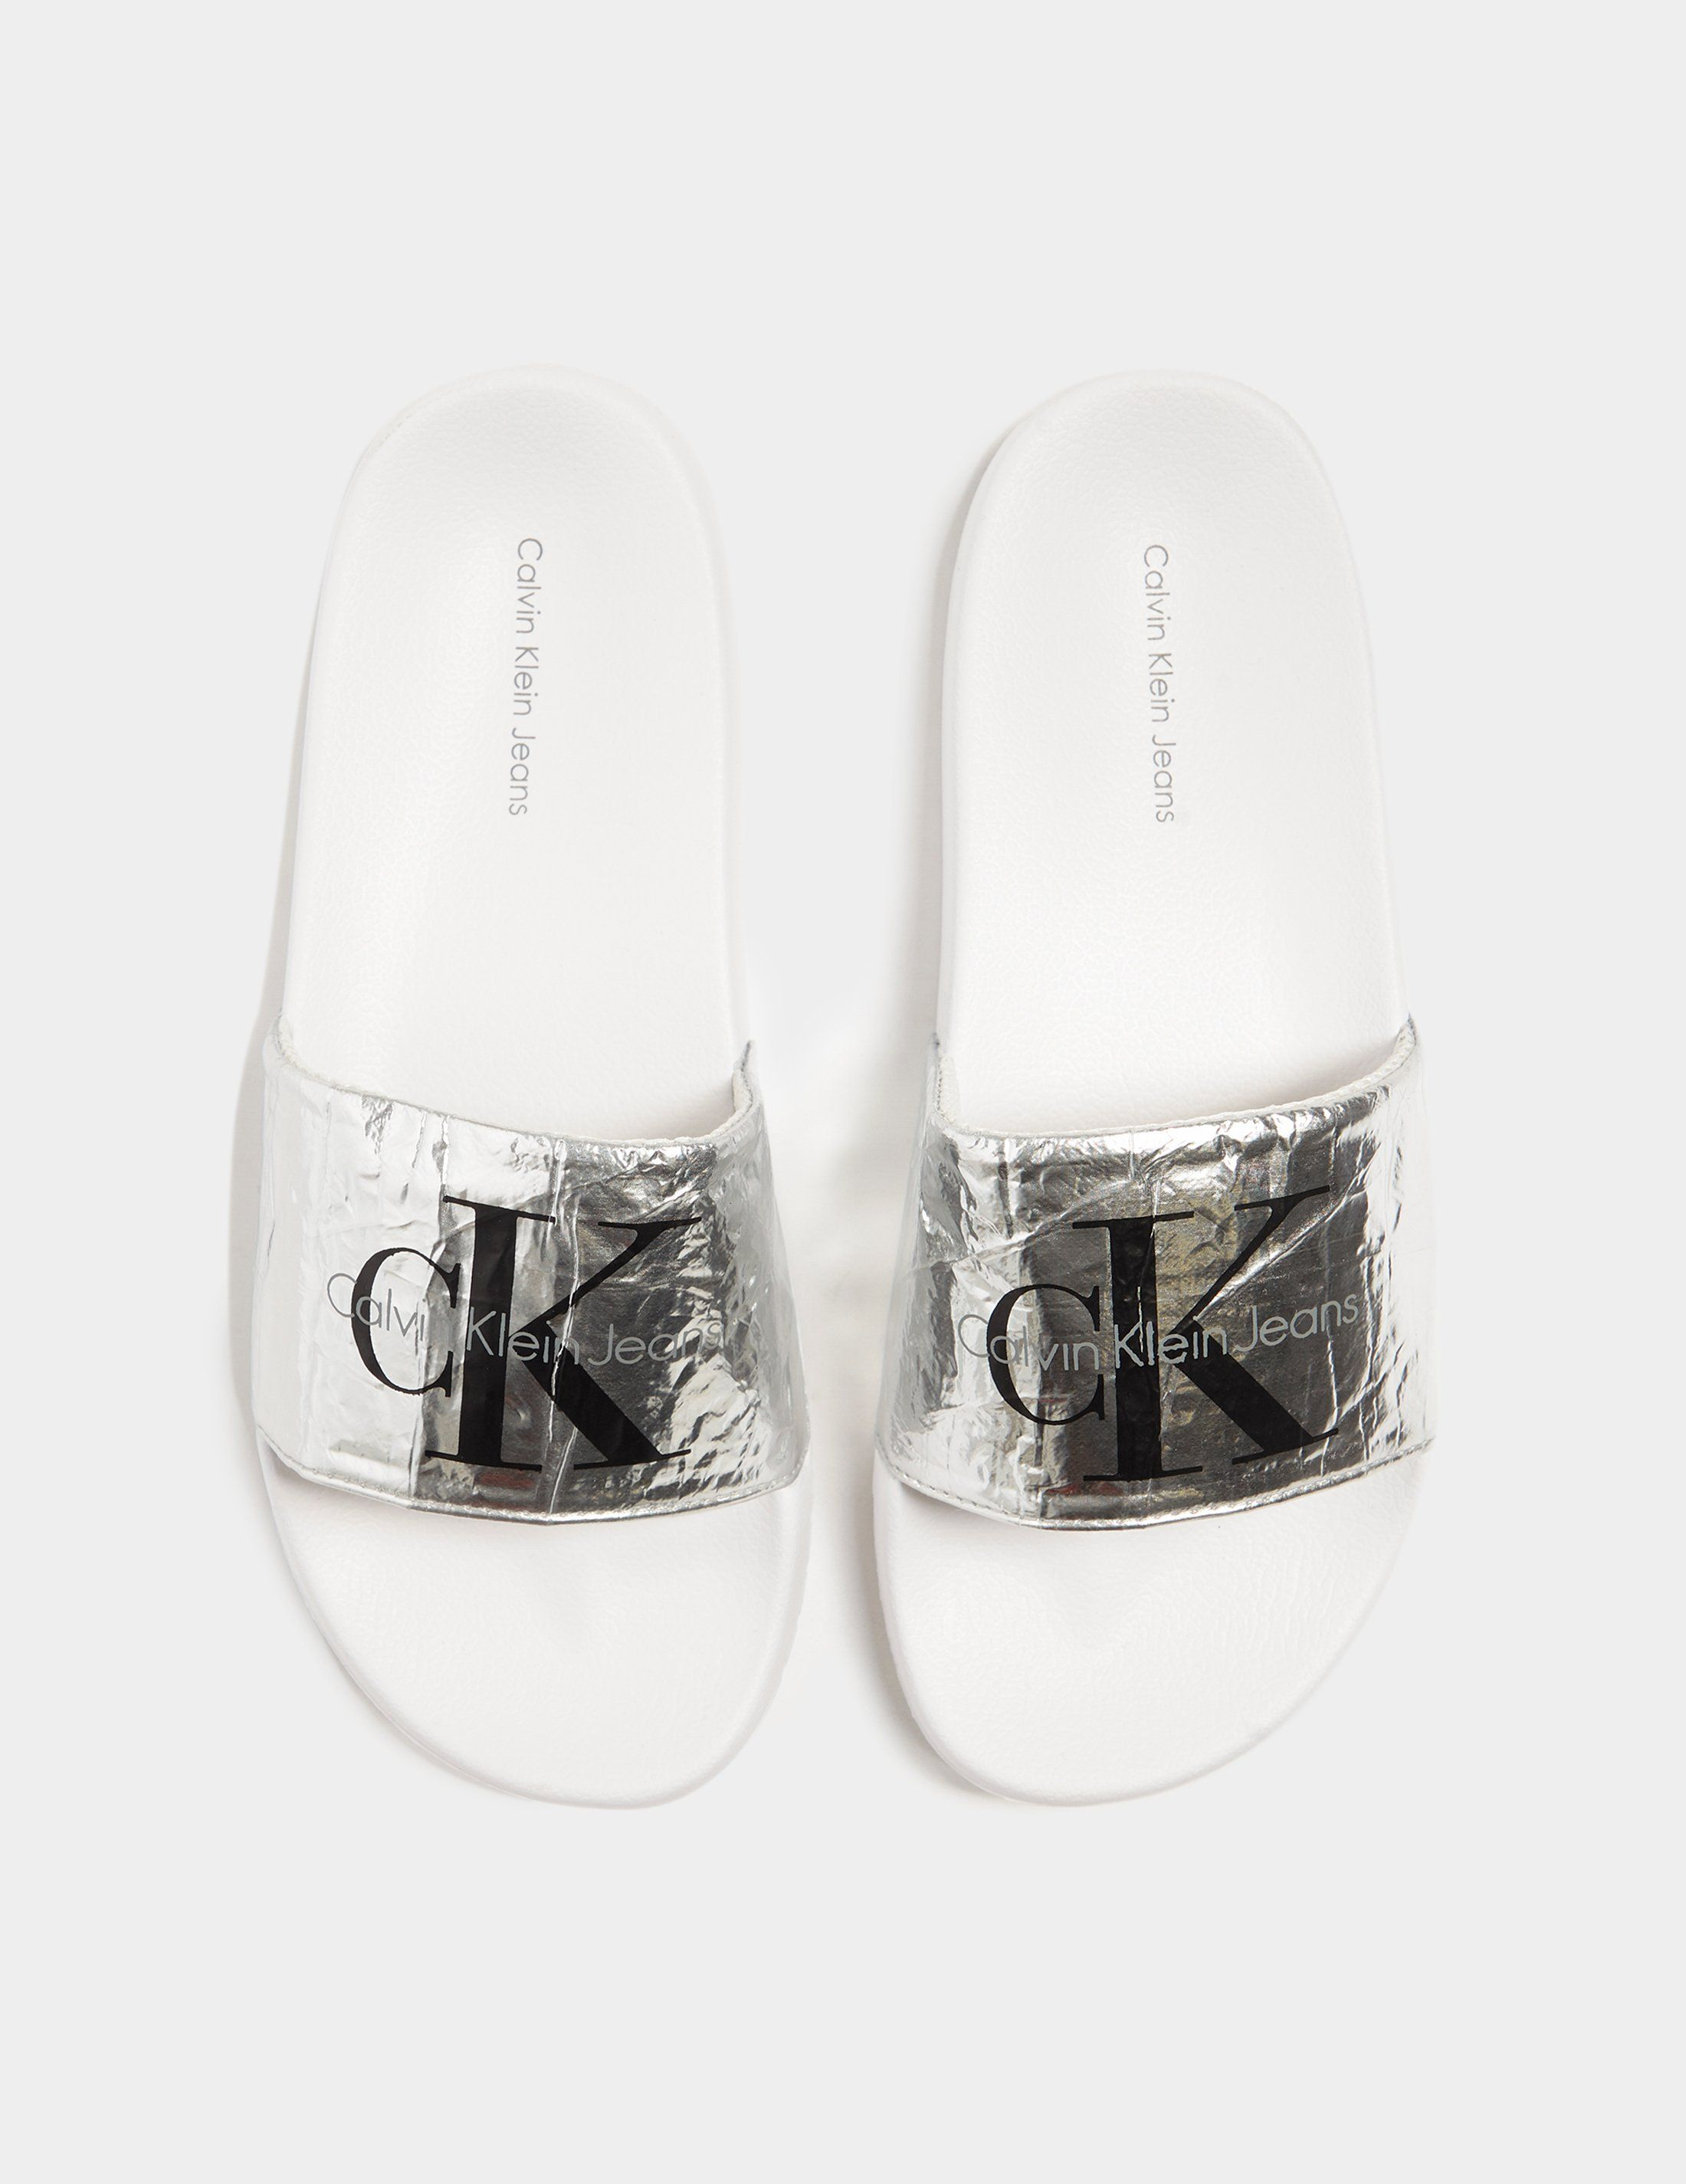 Calvin Klein Jeans Chantal Crinkle Slides